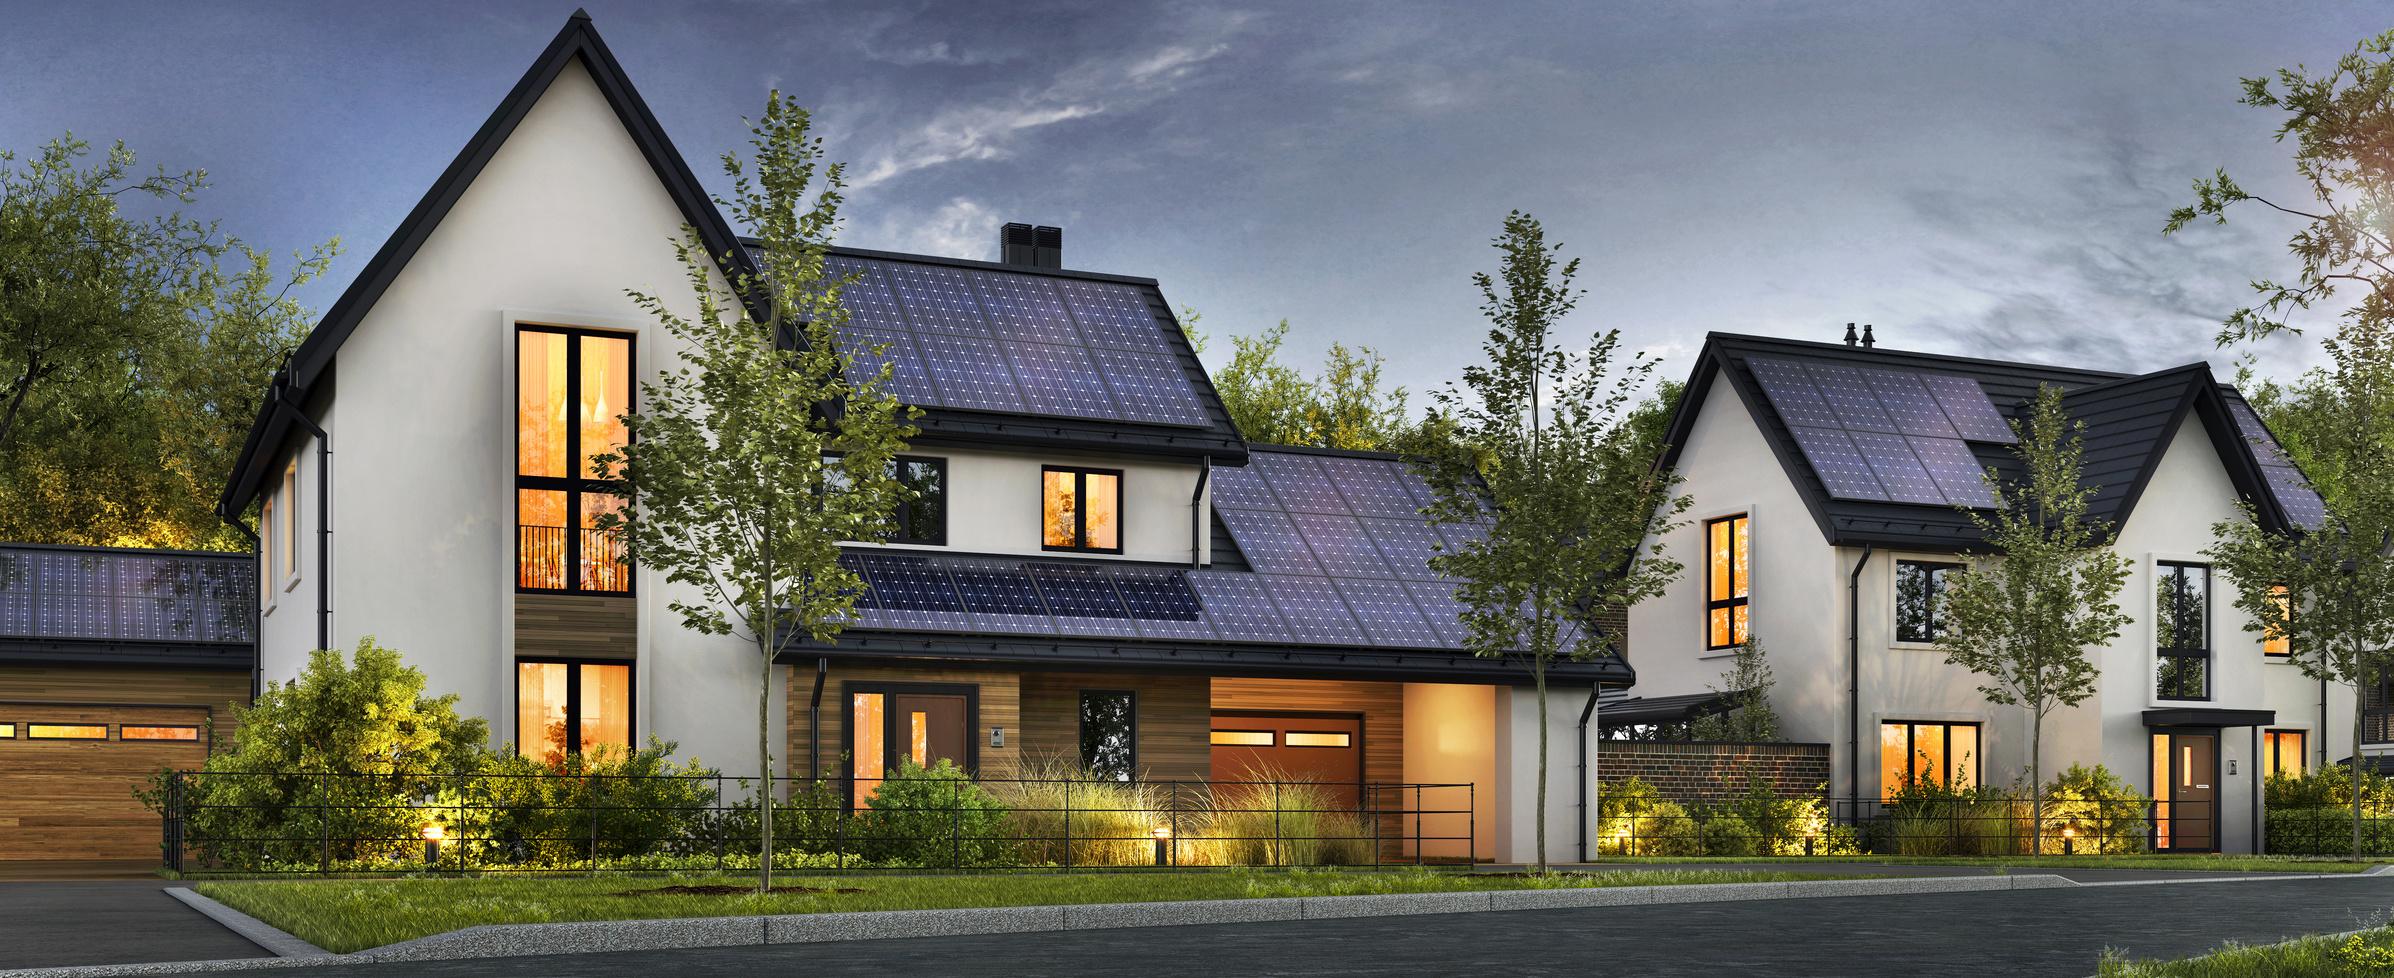 use of solar power